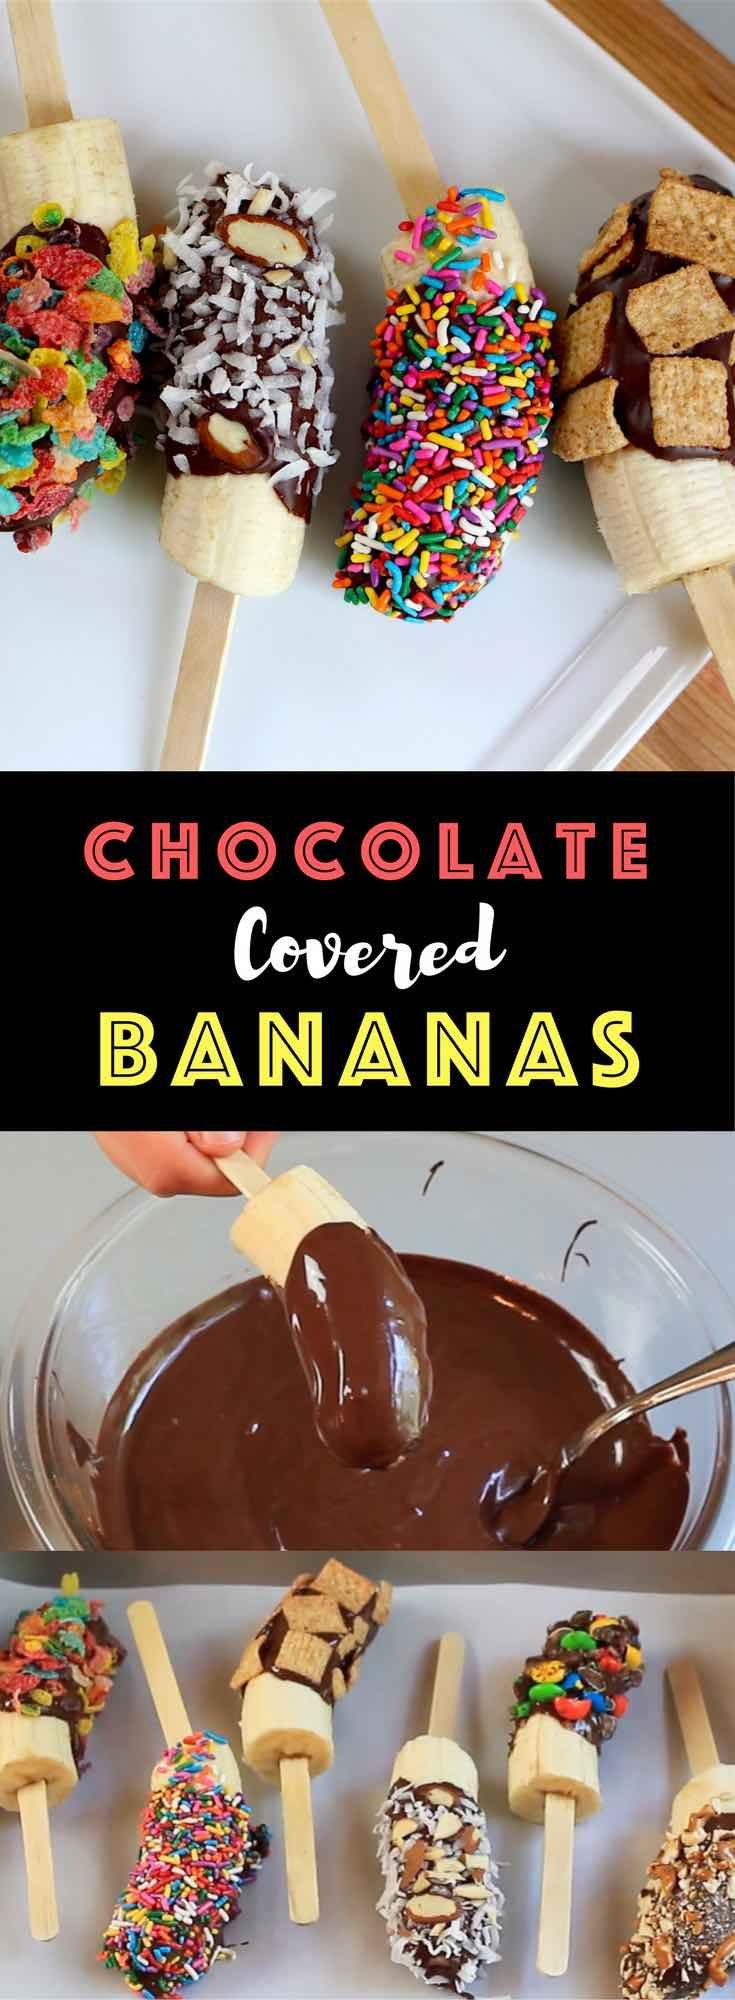 Best 20+ Chocolate covered bananas ideas on Pinterest | Chocolate ...